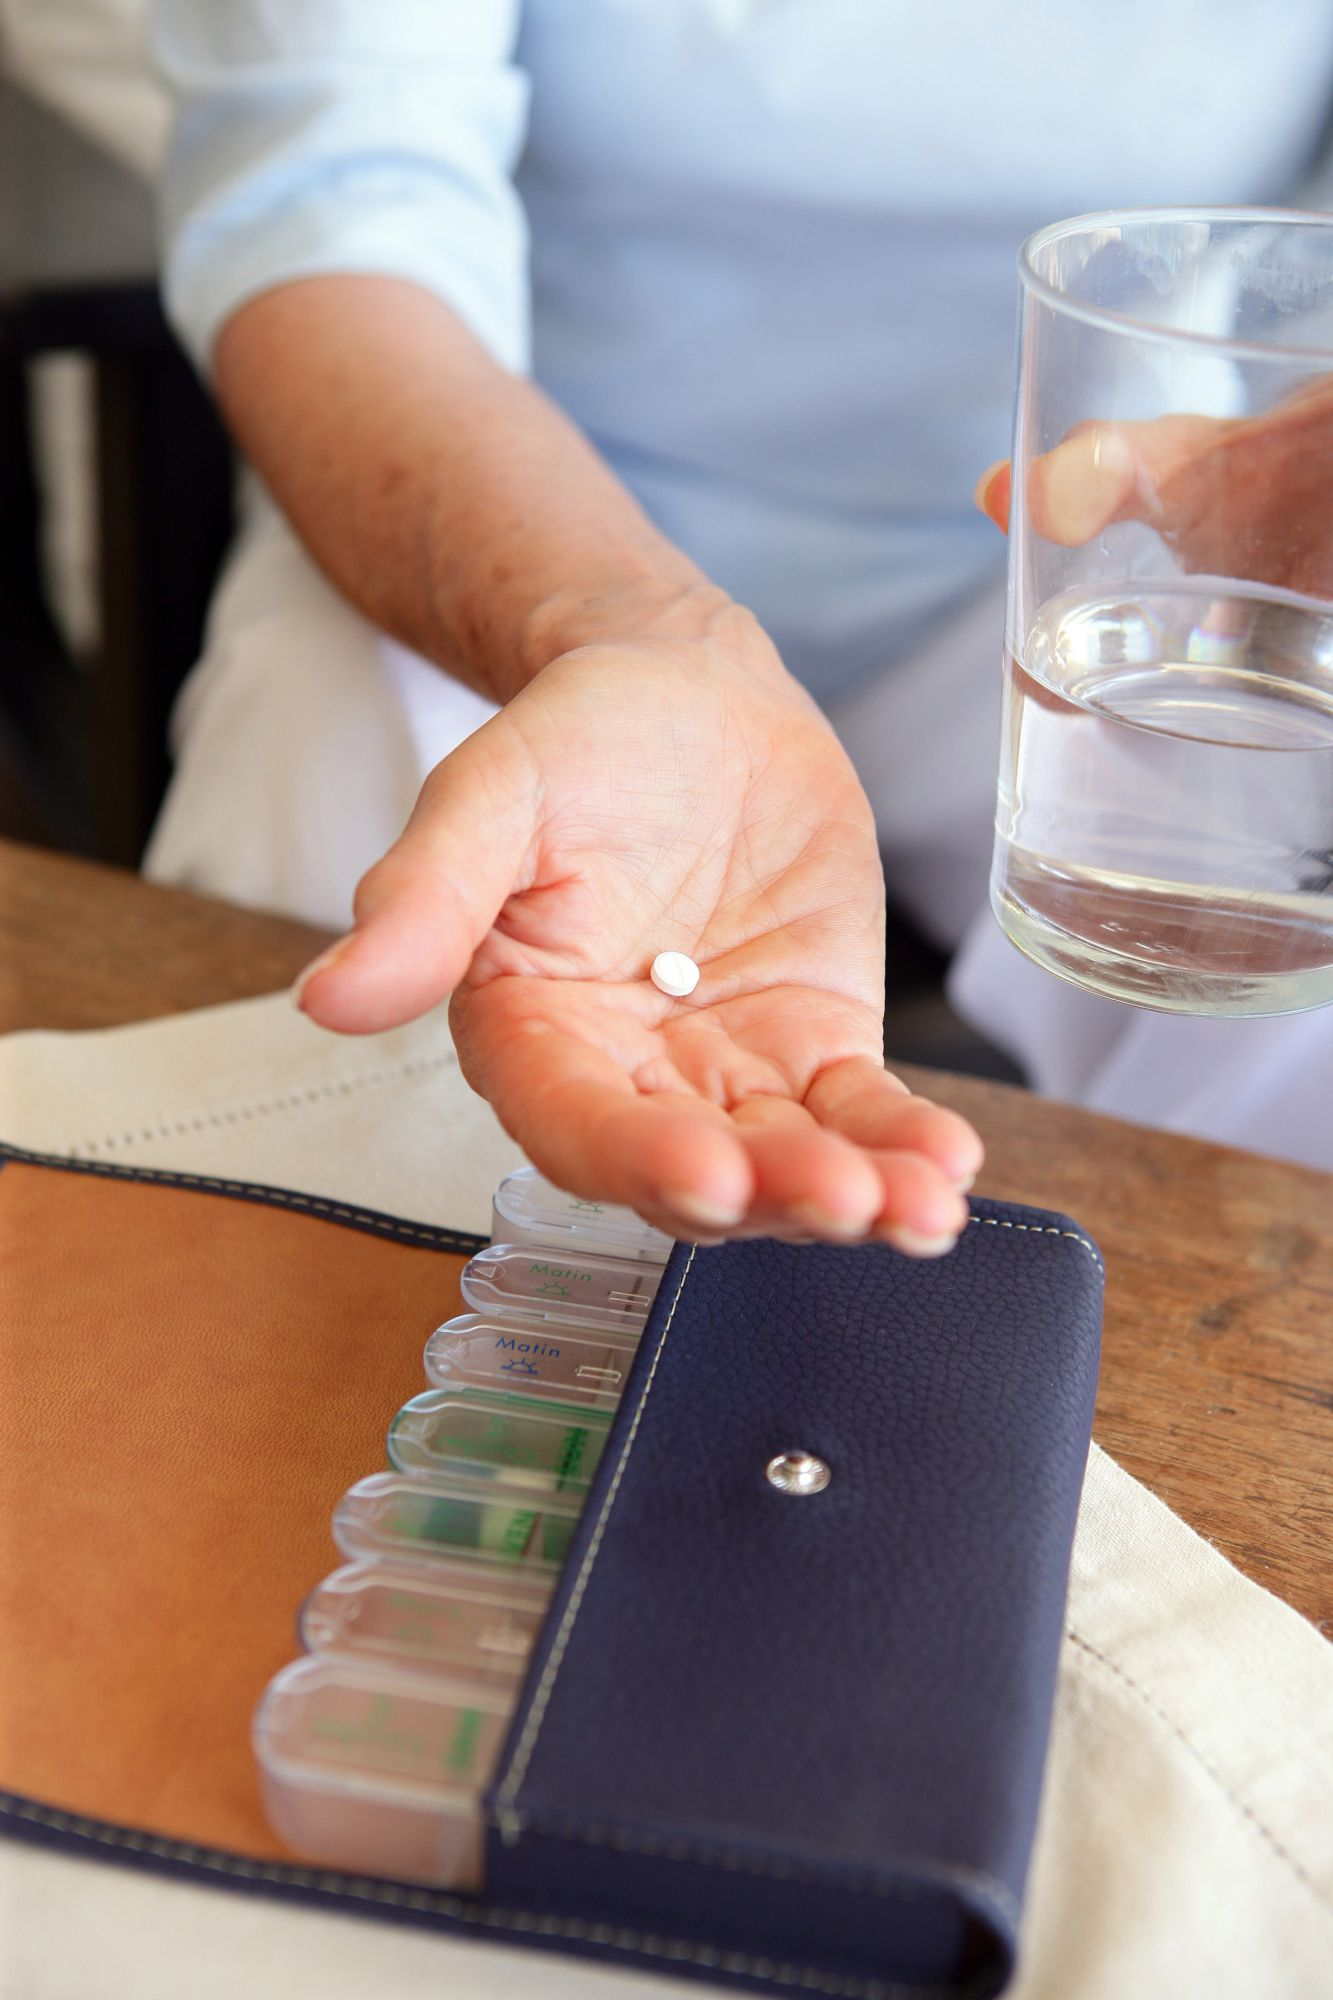 These treatments inhibit the sympathetic nervous system. © Phovoir